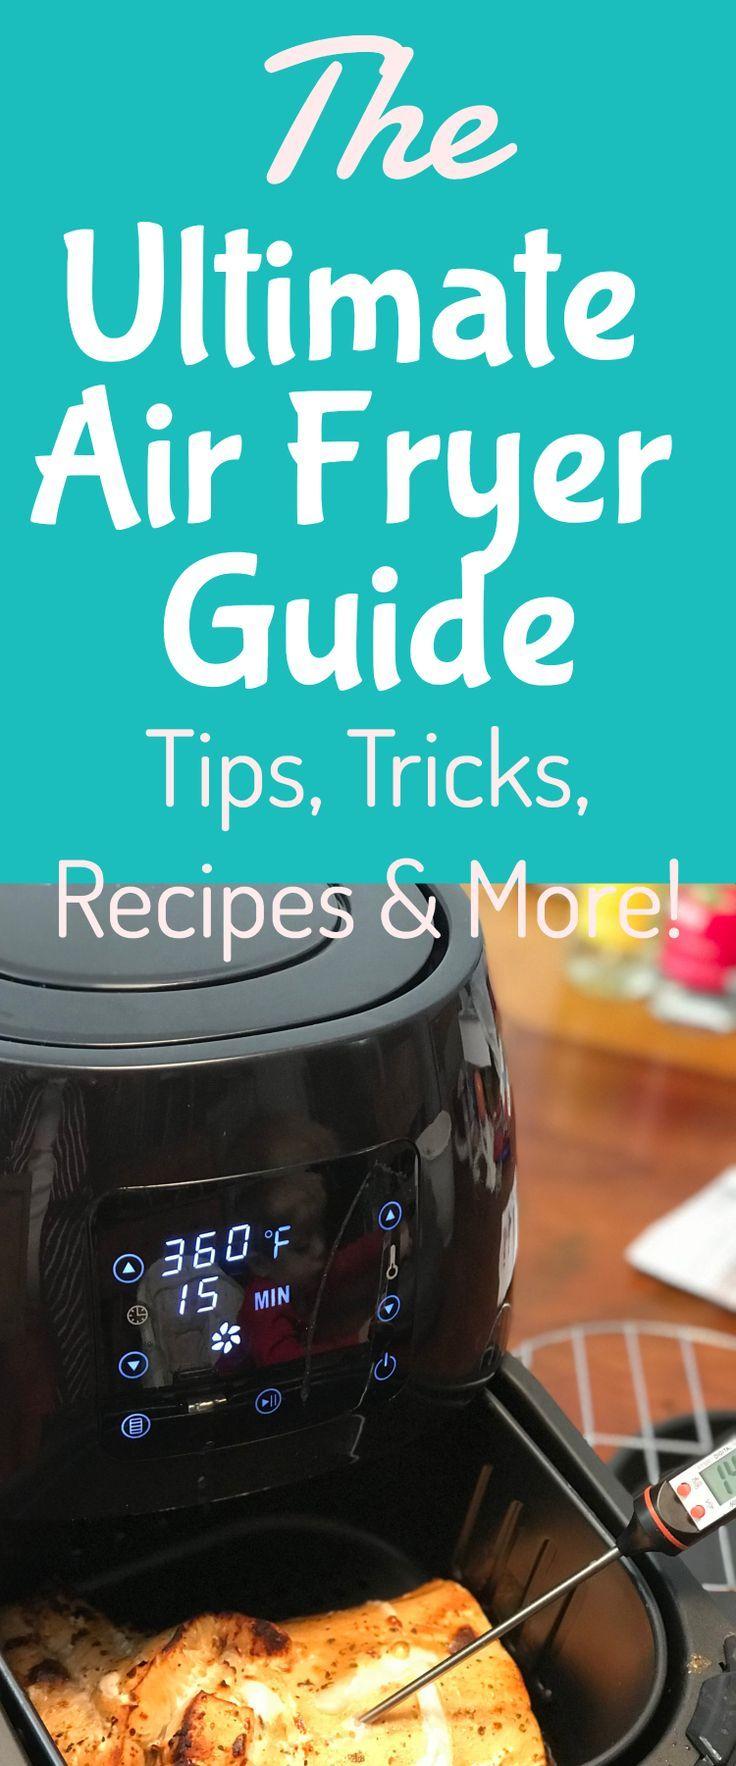 Air Fryer / Air Fryer Guide / #AirFryer #AirFryerRecipes #Food #EasyRecipes Air Fryer Recipes via @clarkscondensed